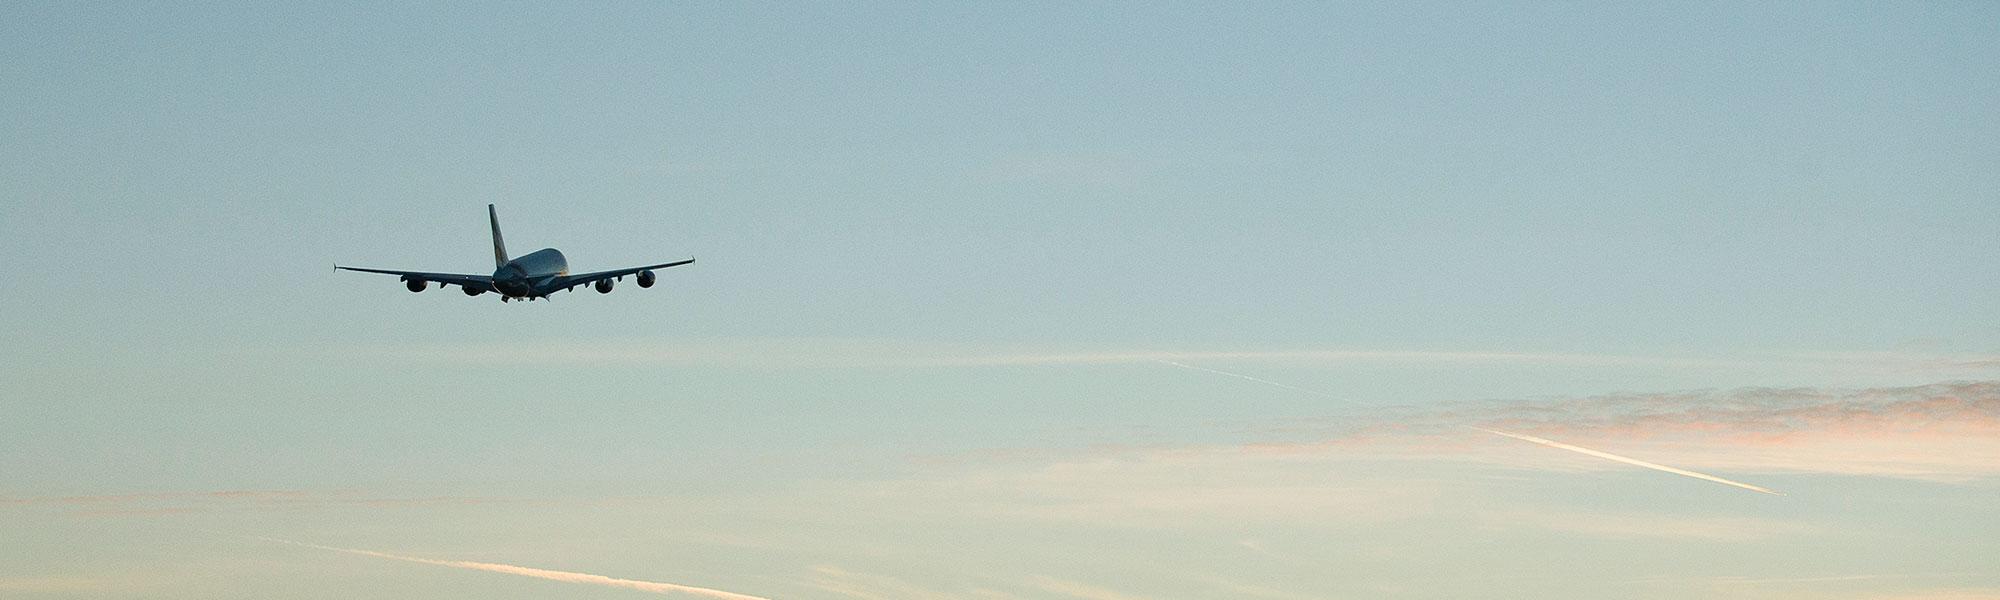 Takeoff - Copenhagen Airport